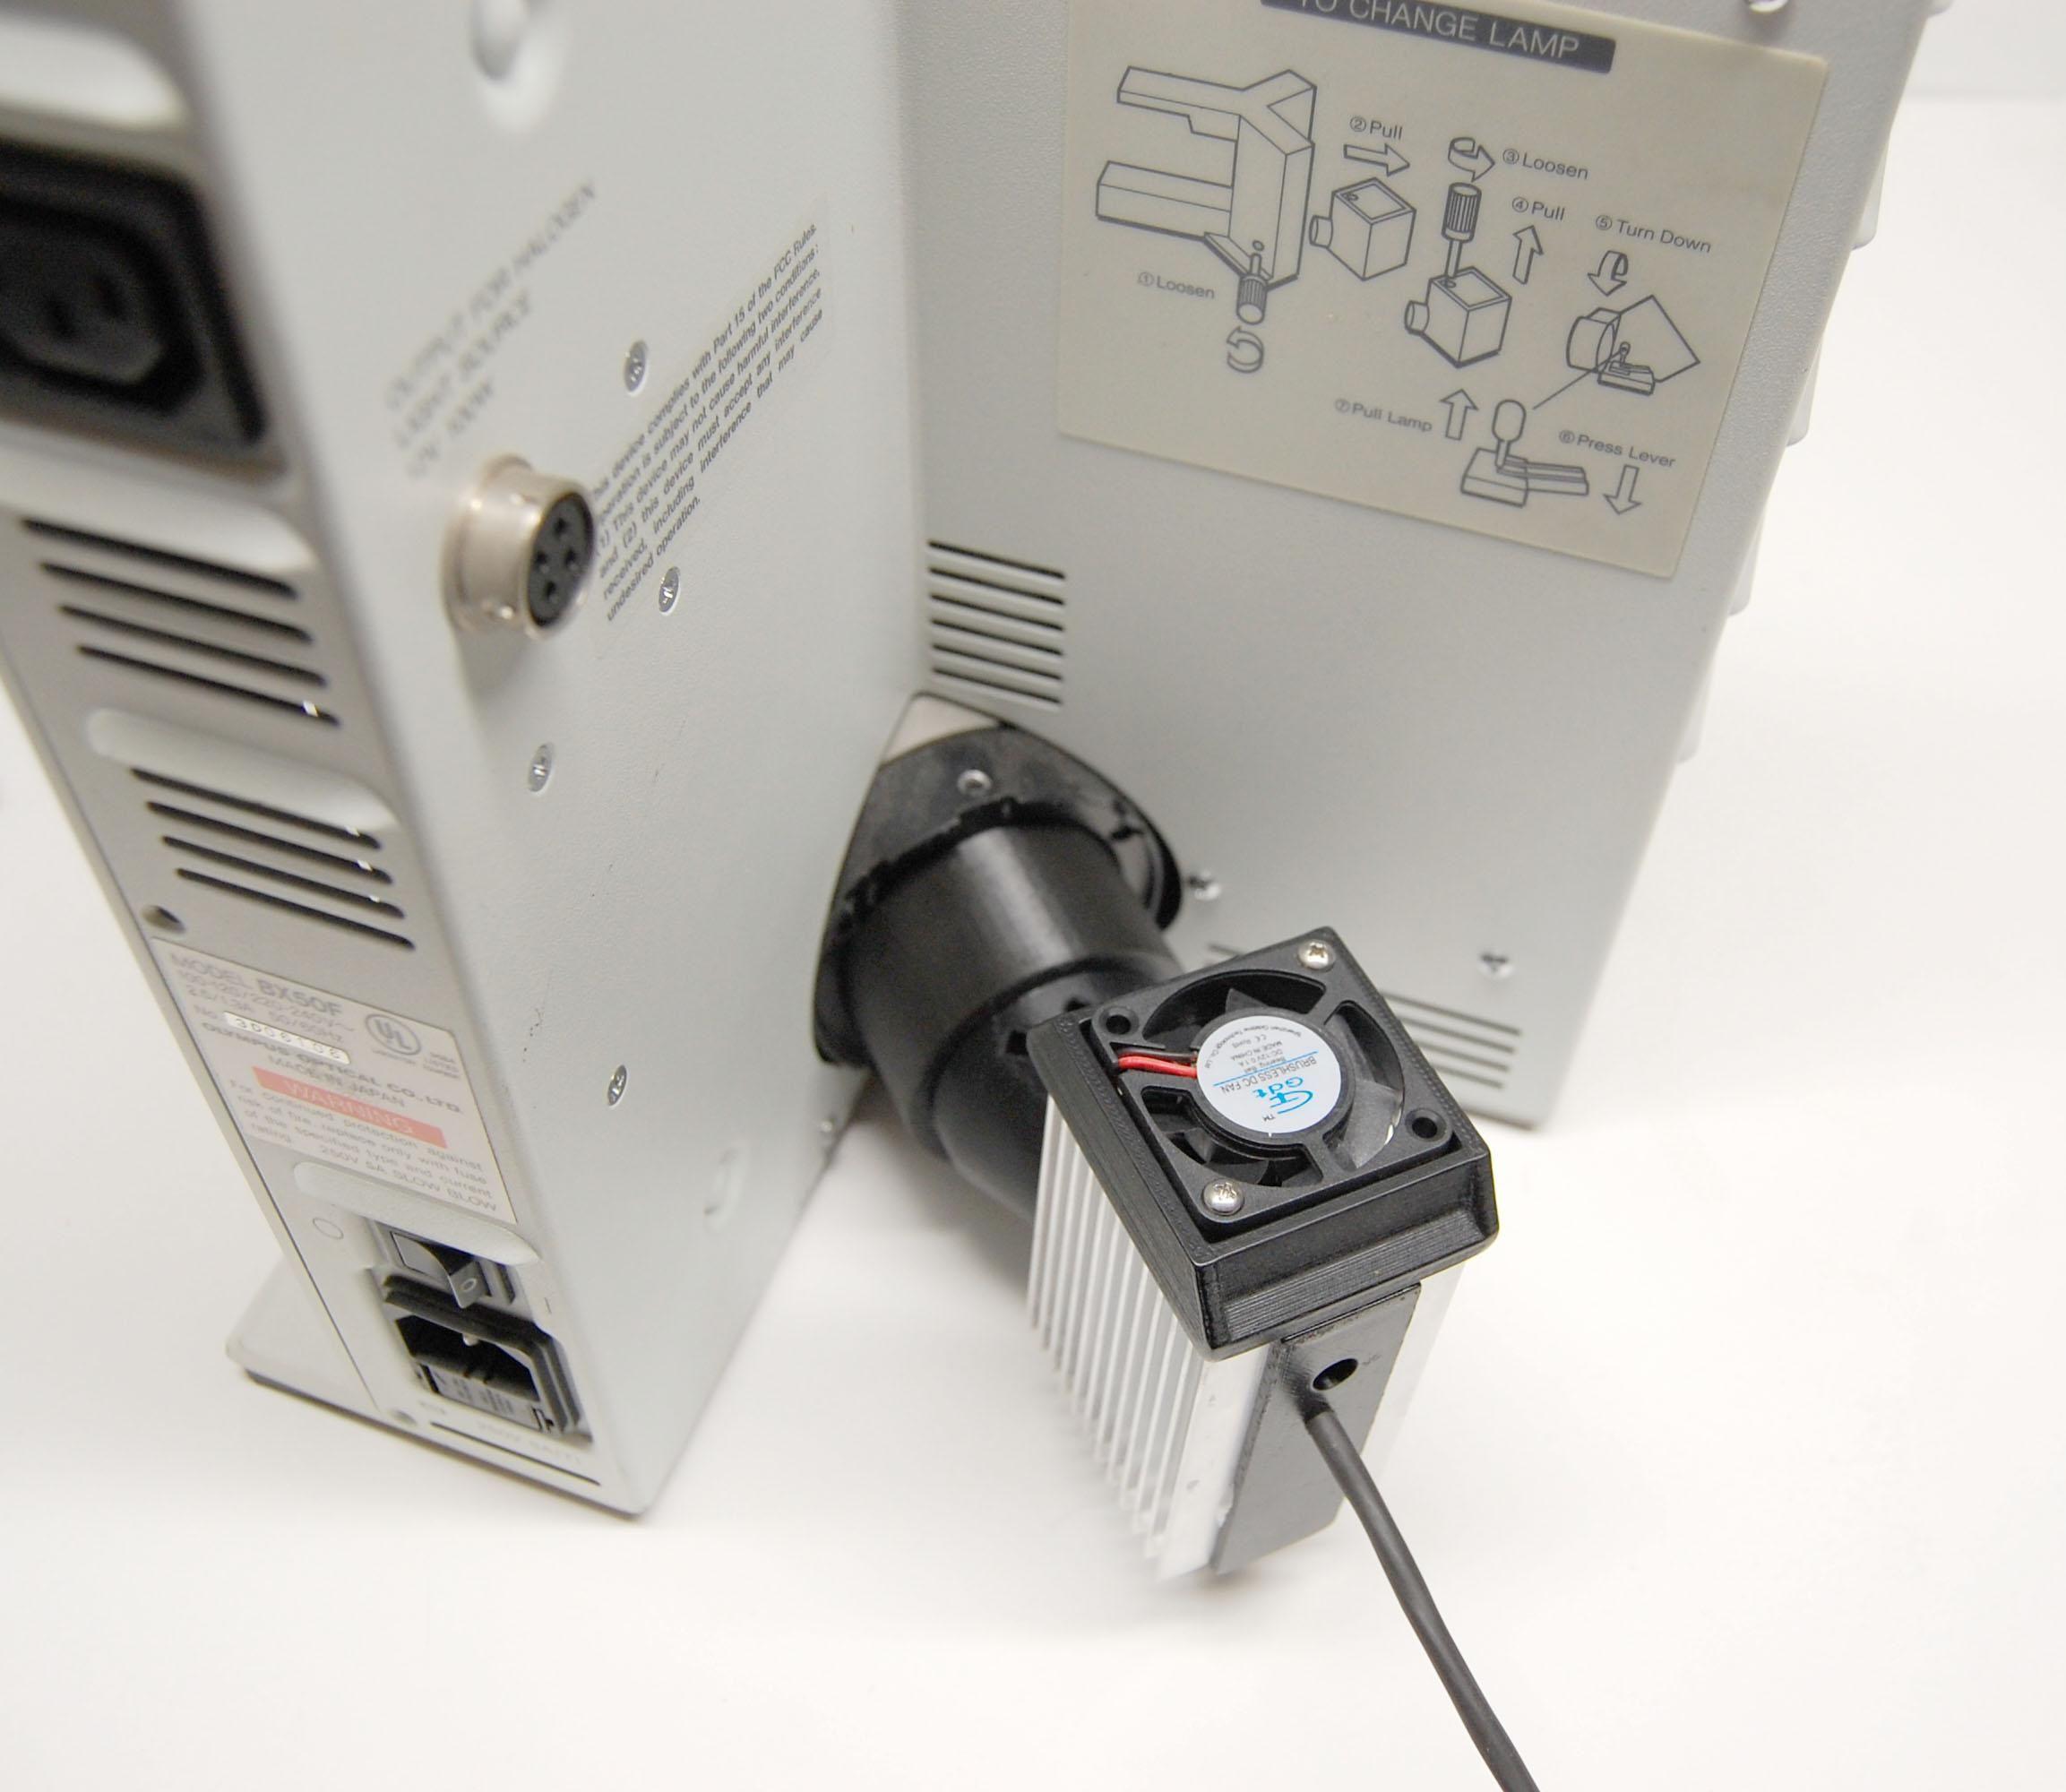 New 20w LED Illuminator for Olympus BX 50, 51 Microscopes